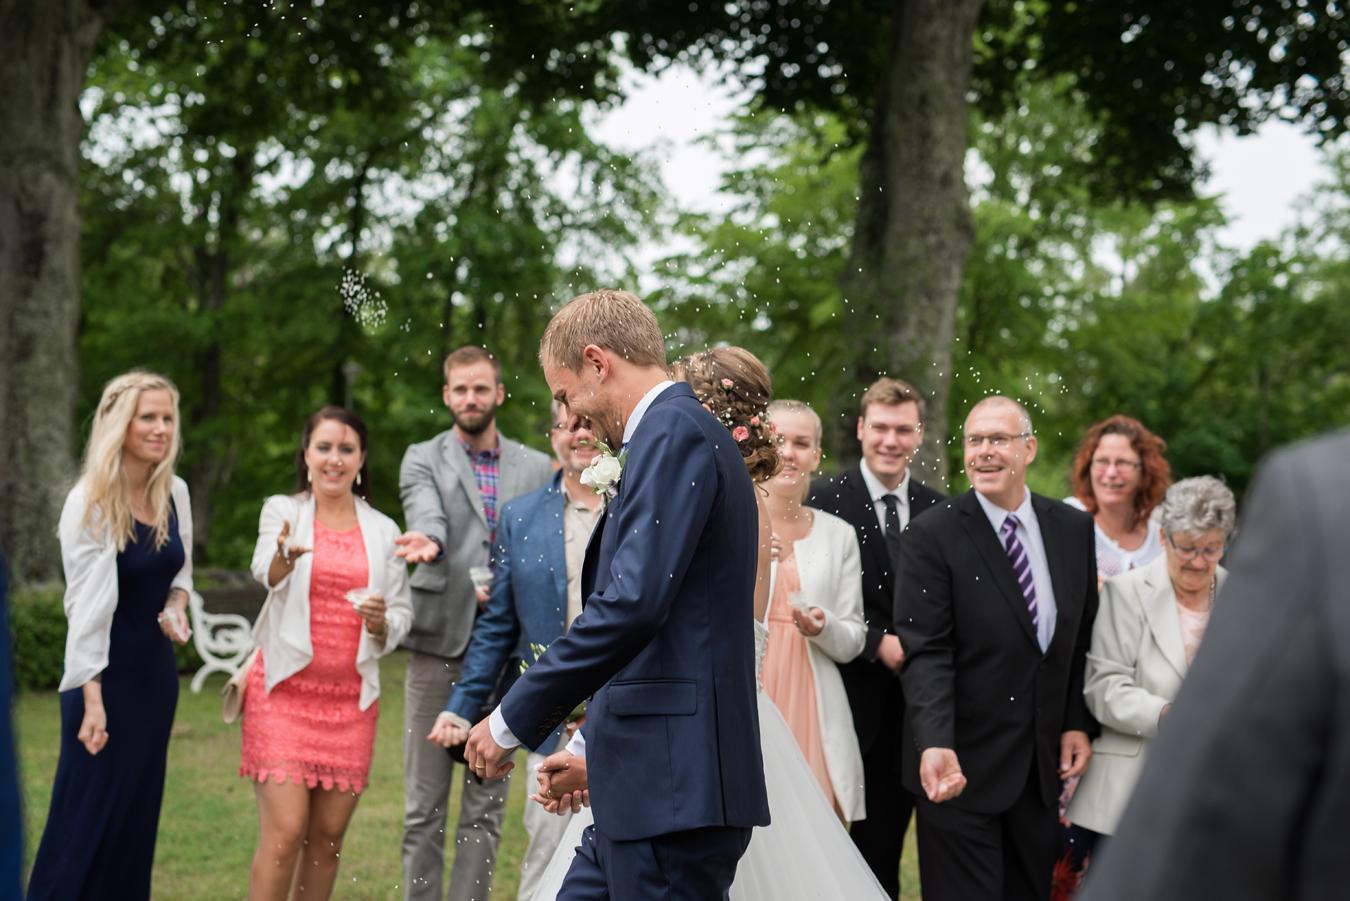 009-bröllopsfotograf-folhammar-gotland-neas-fotografi.jpg